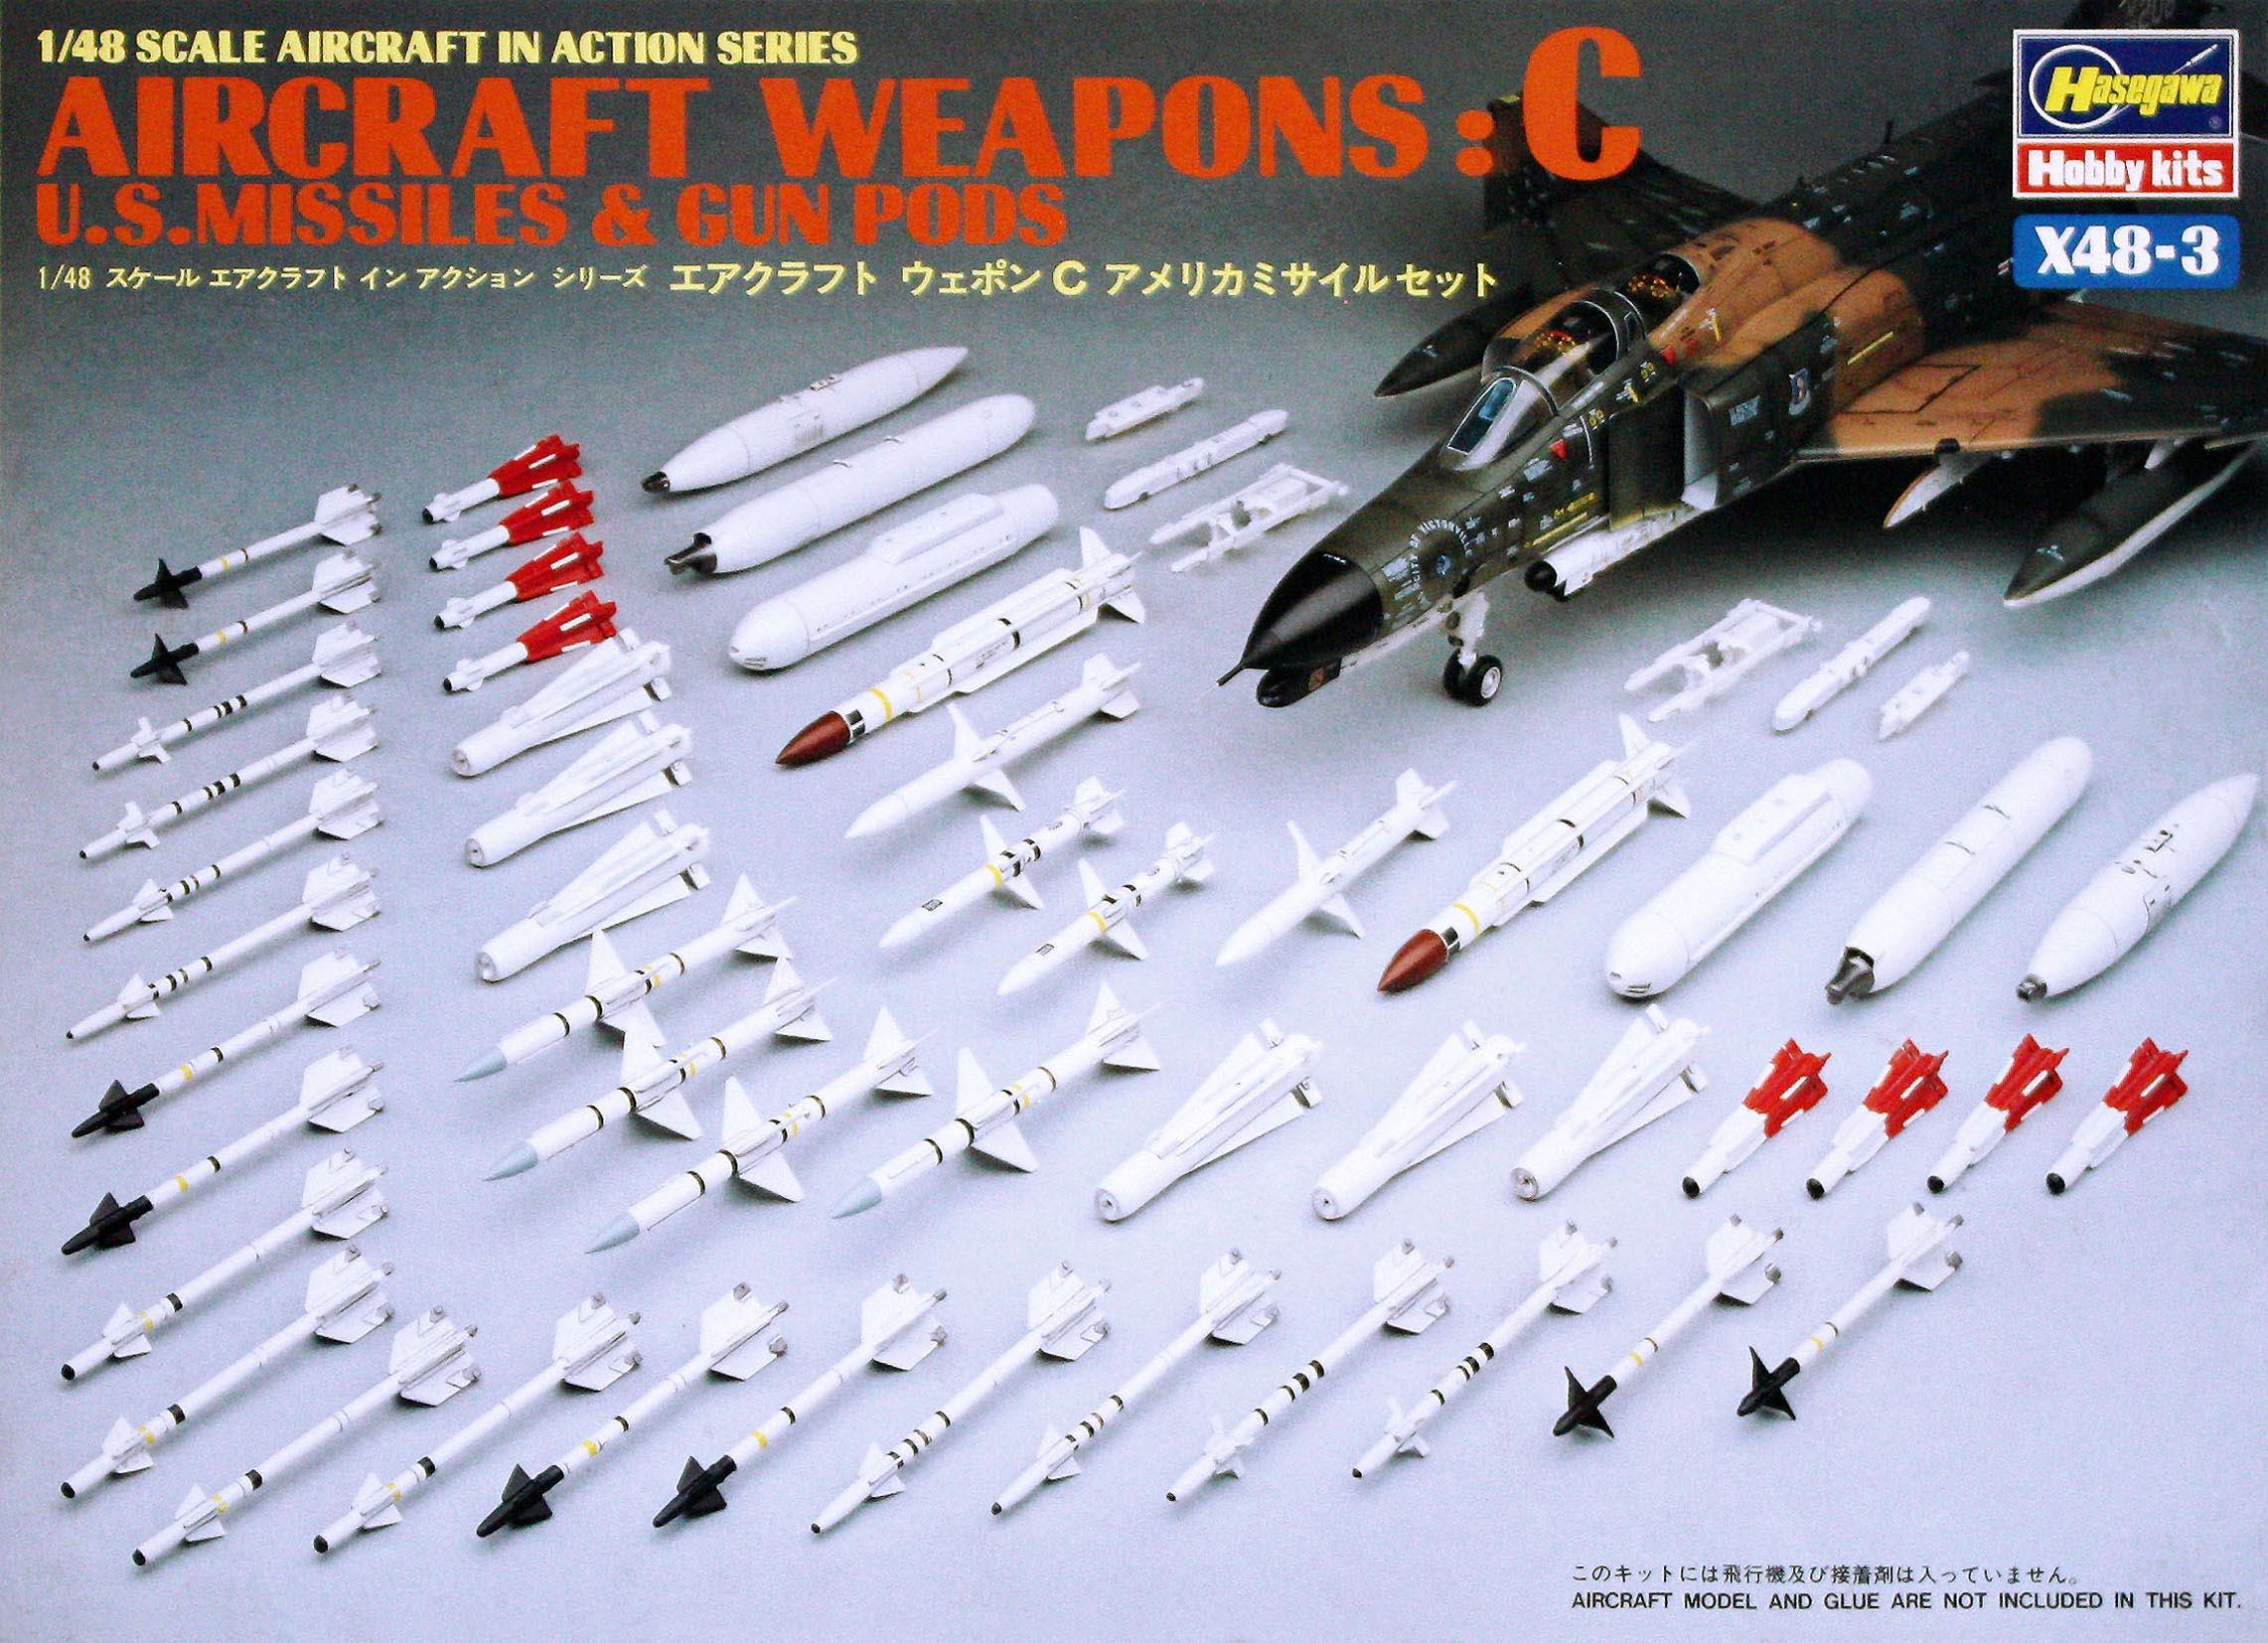 Hasegawa 1/48 US Aircraft Weapons C X48-3